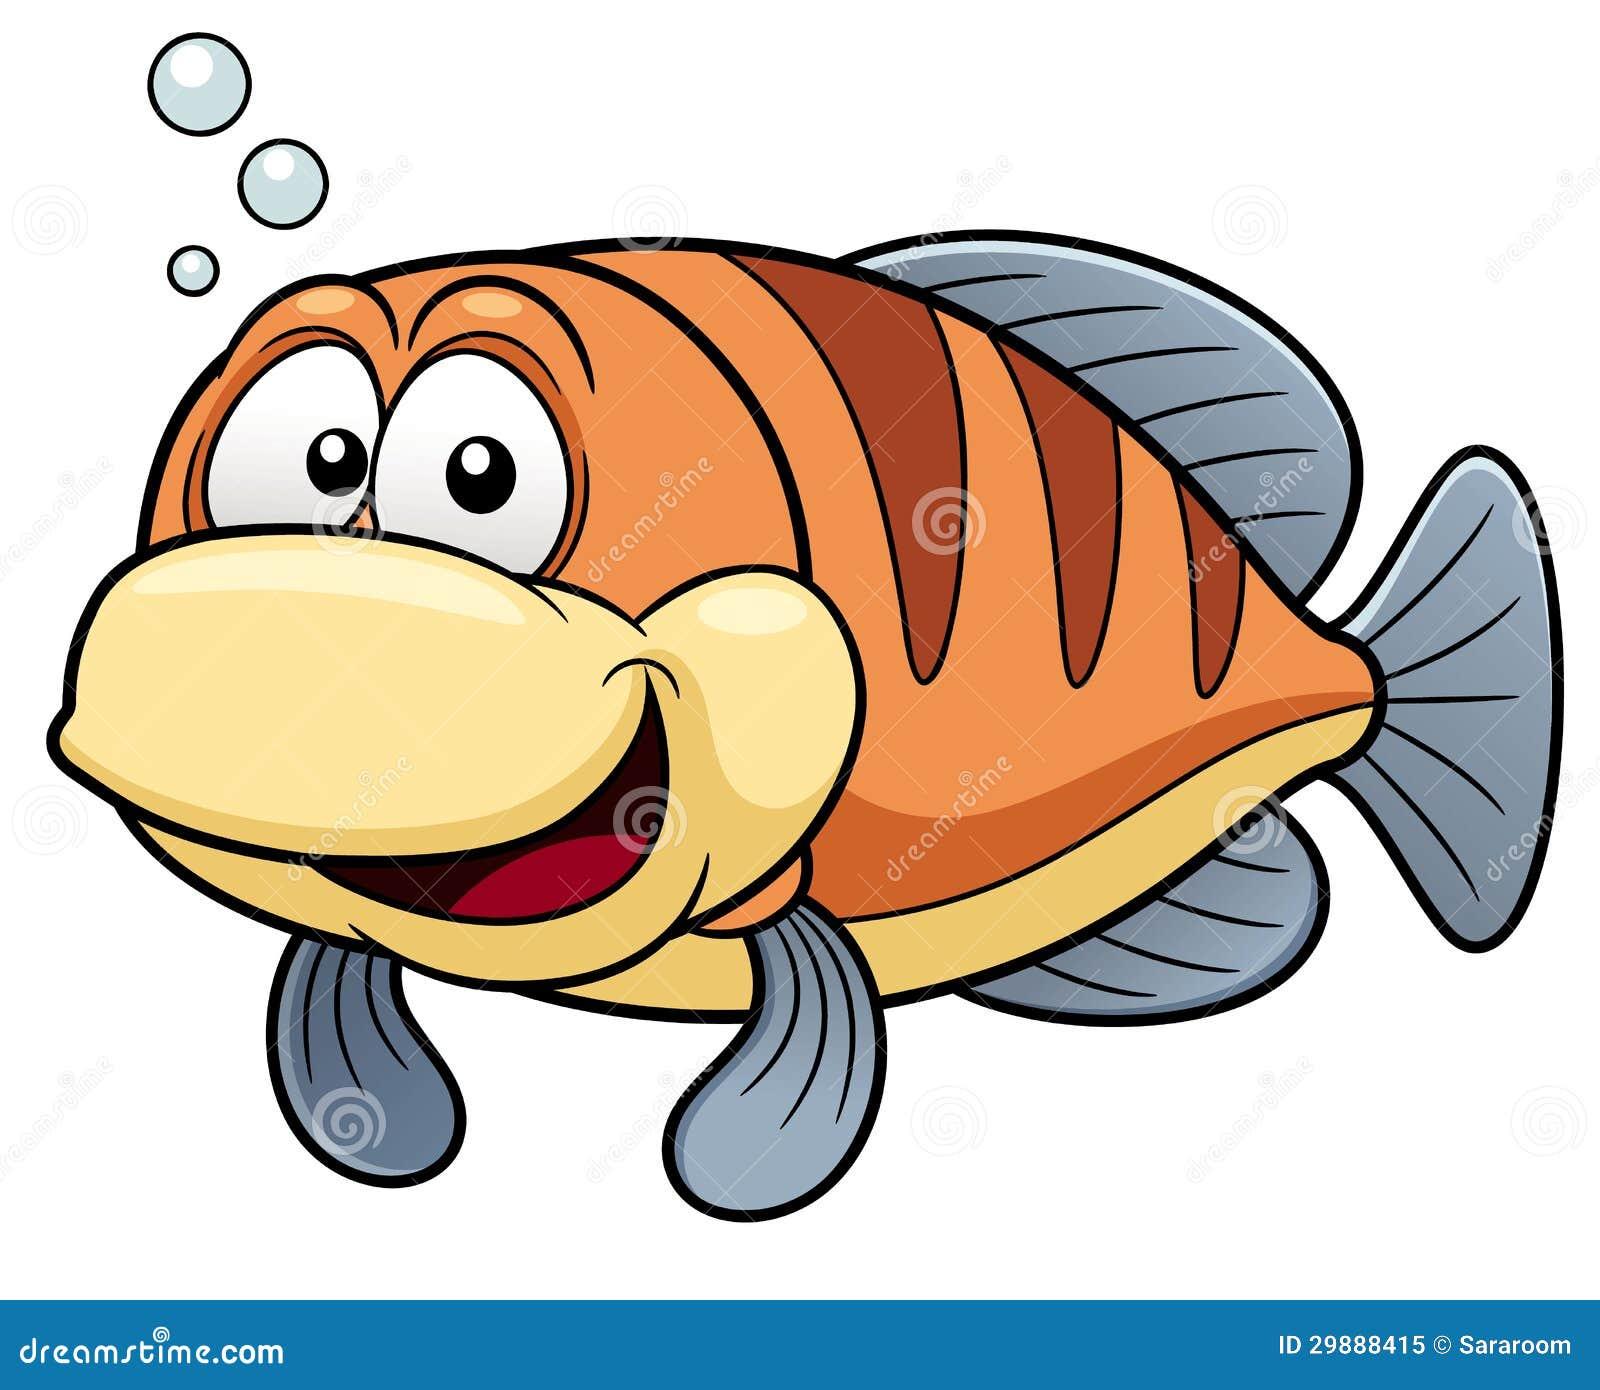 Cartoon Fish Royalty Free Stock Photo - Image: 29888415